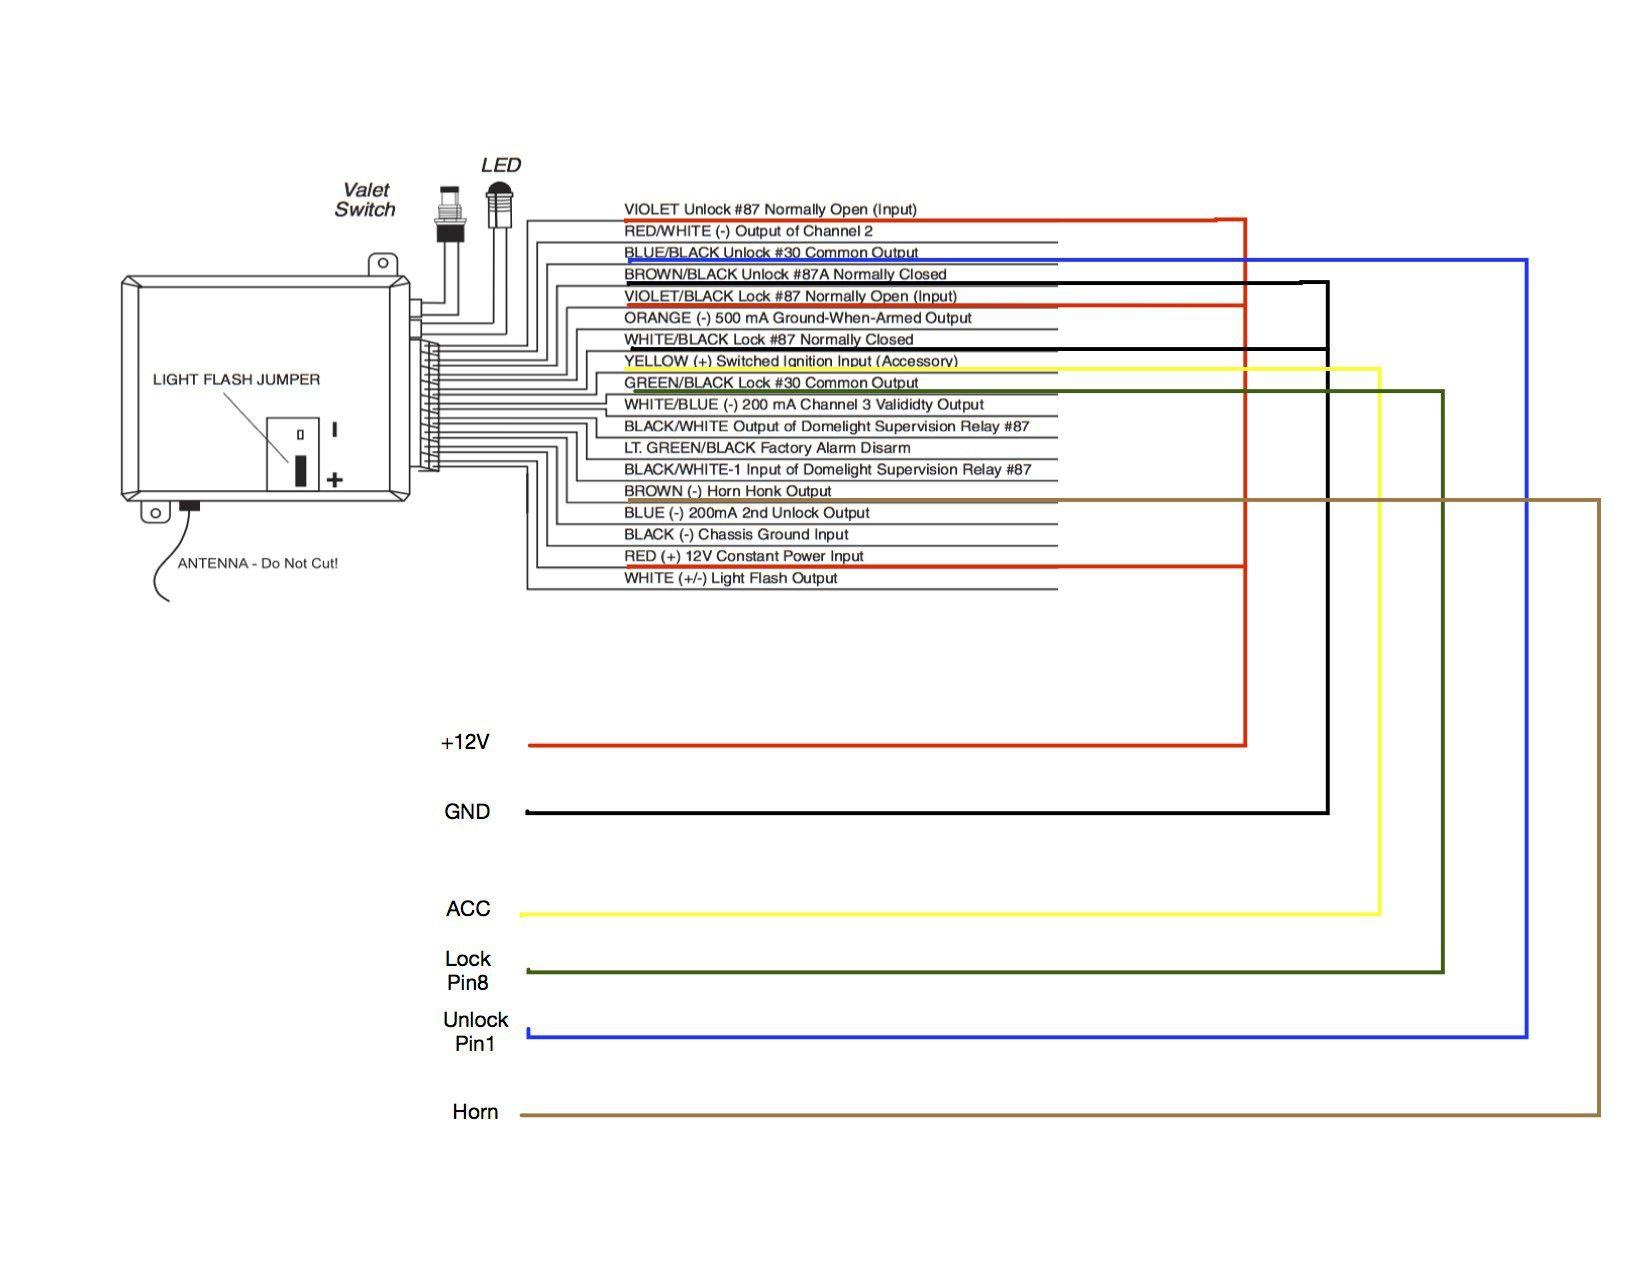 Viper 5305V Wiring Diagram Luxury Viper 3000 Wiring Diagram Wiring - Viper 5305V Wiring Diagram